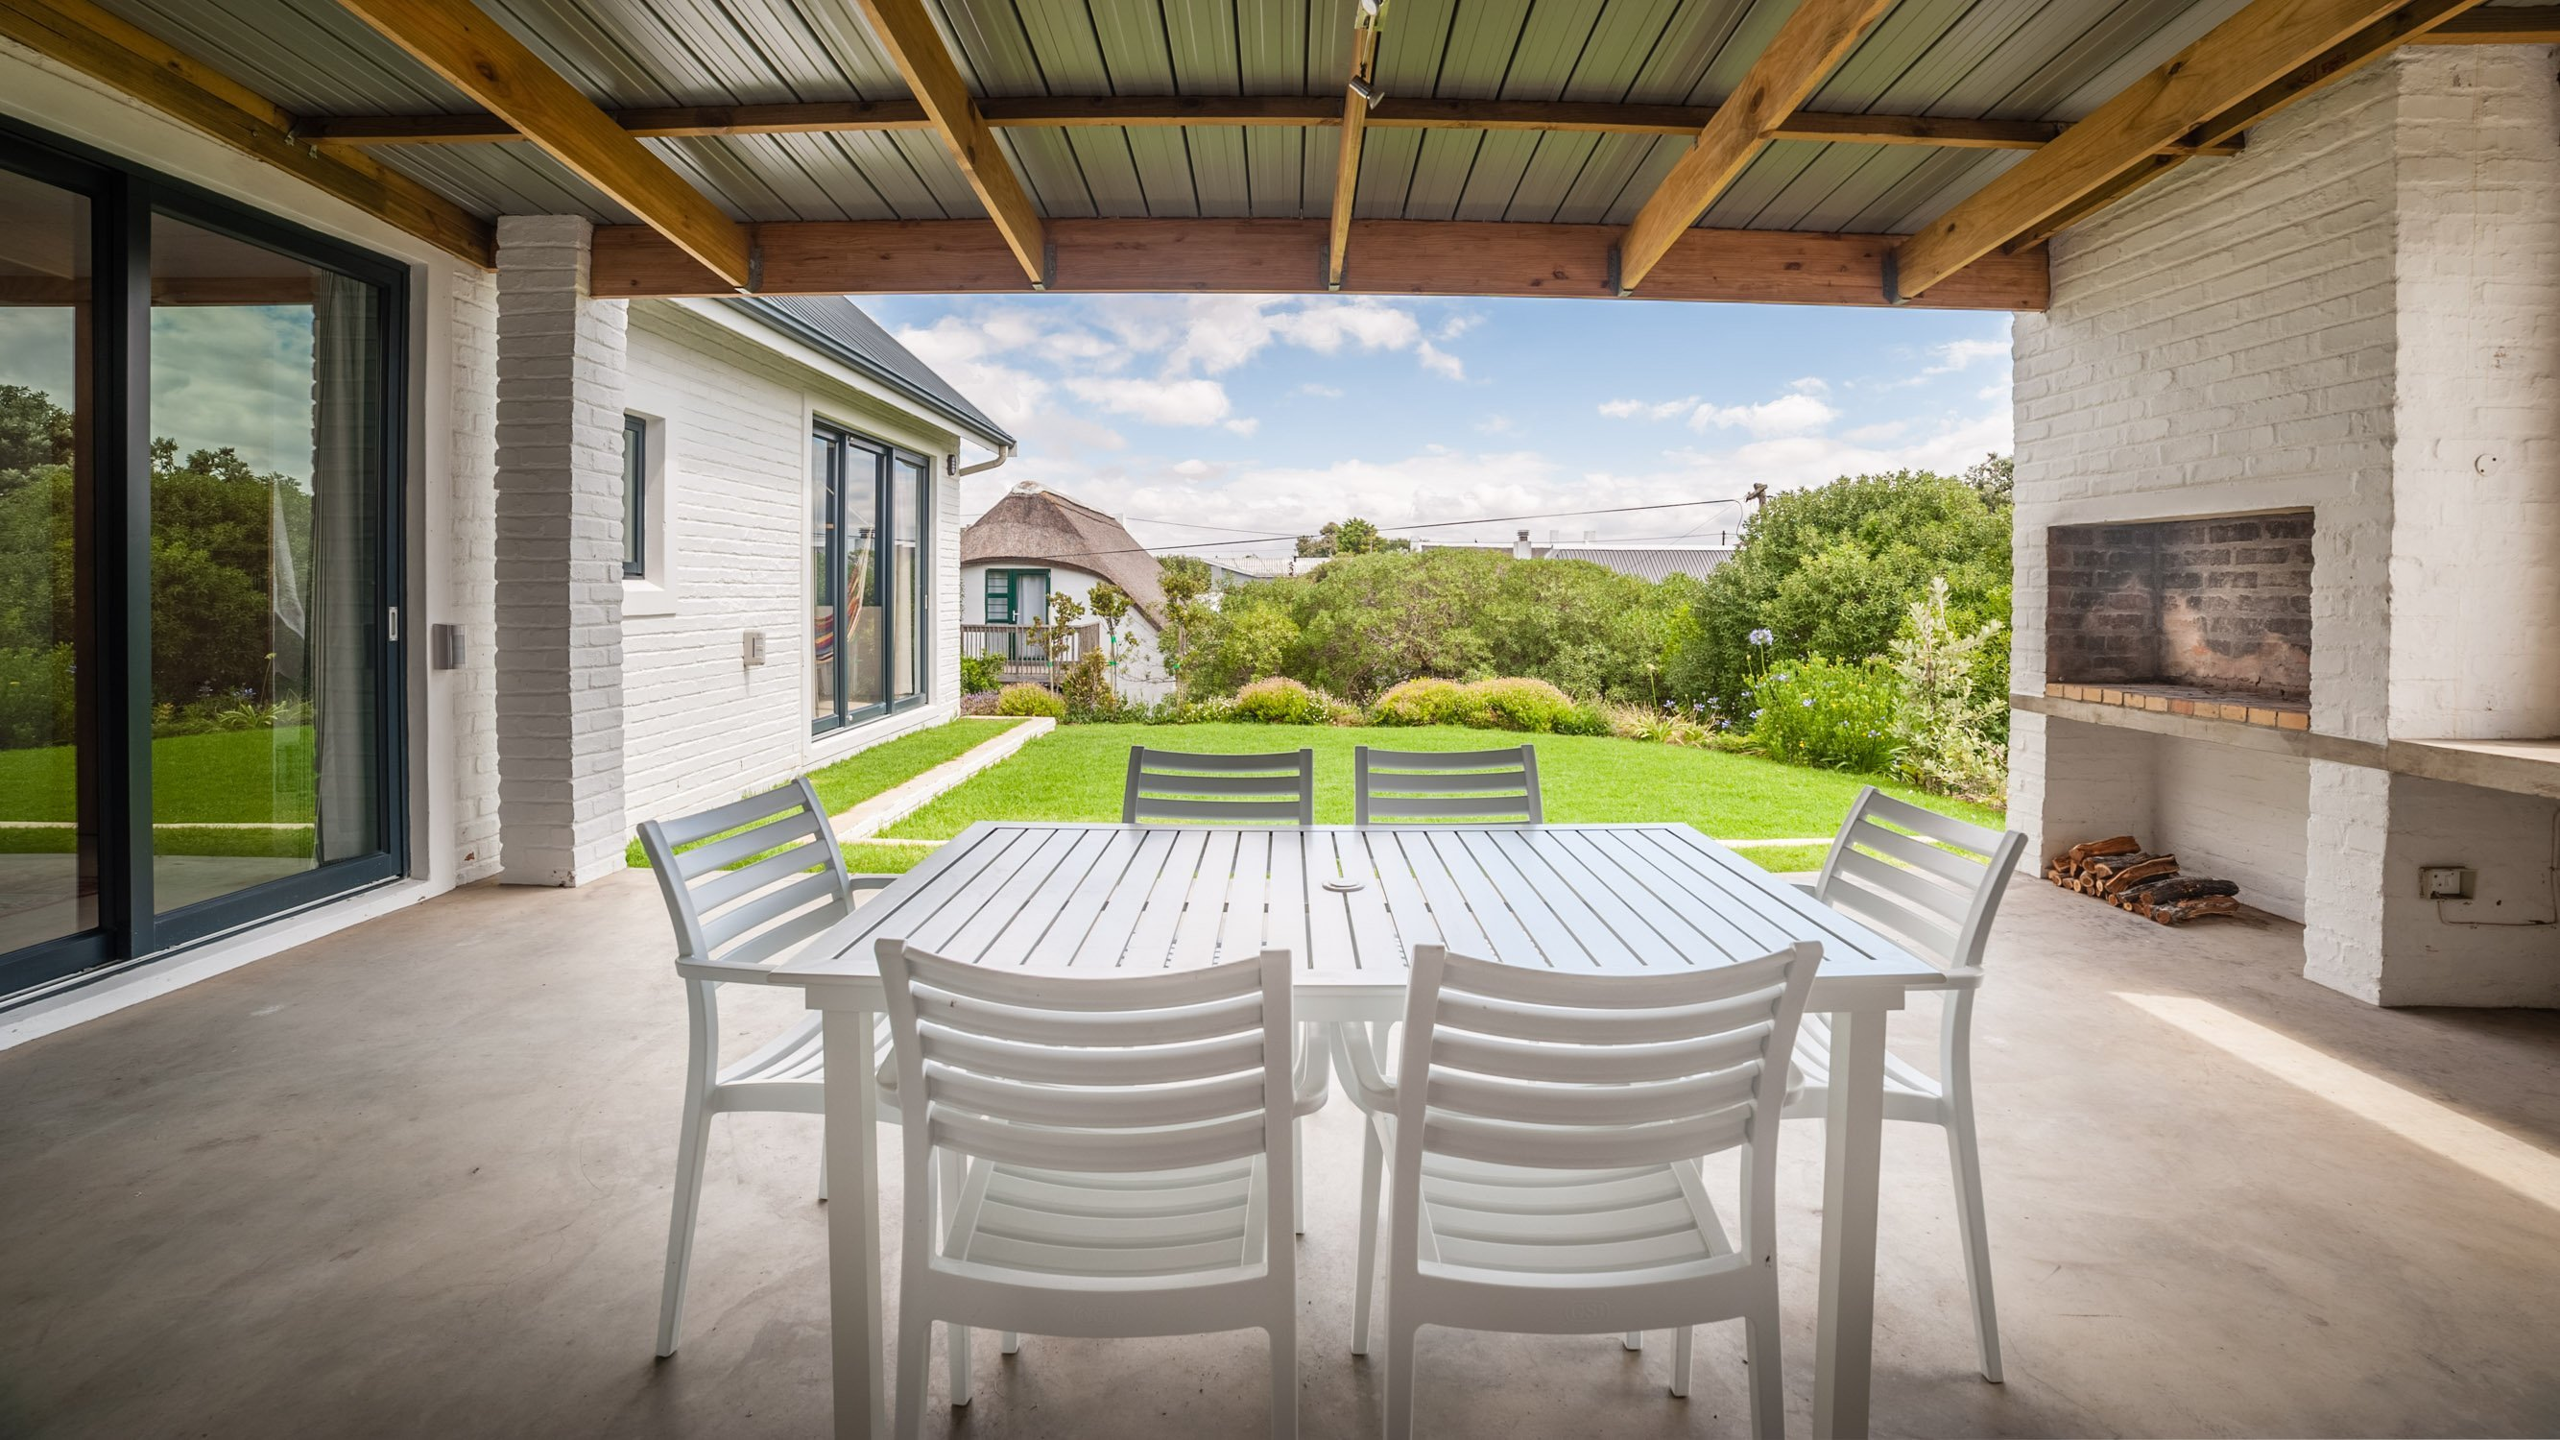 charel-schreuder-photography-property-photography-rear-patio-braai-garden-area